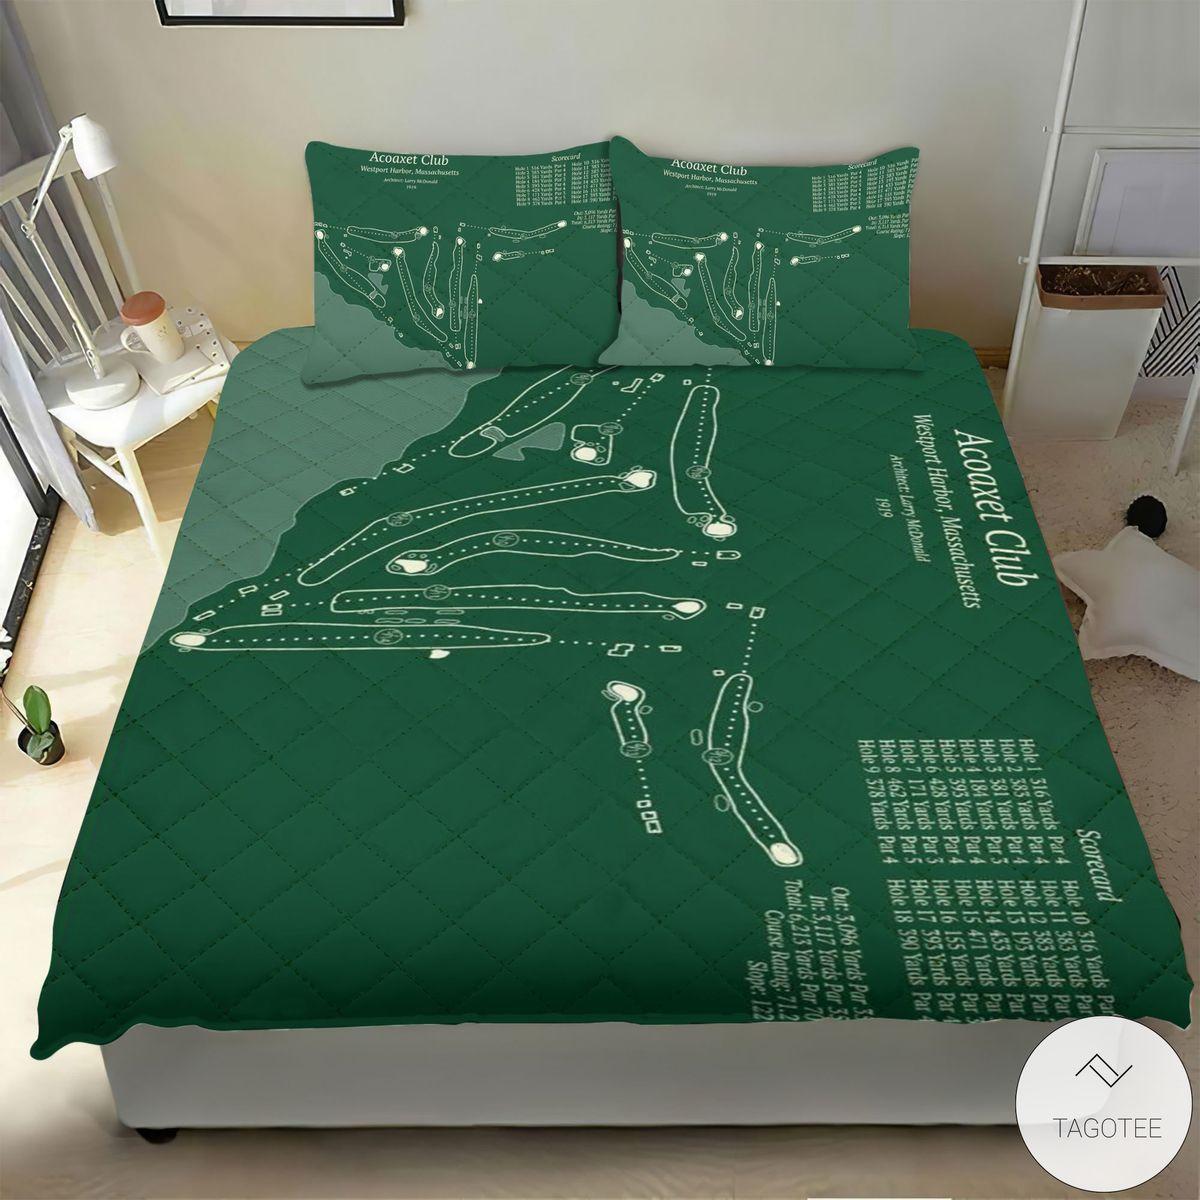 Acoaxet Club Map 3D Quilt Bedding Setx